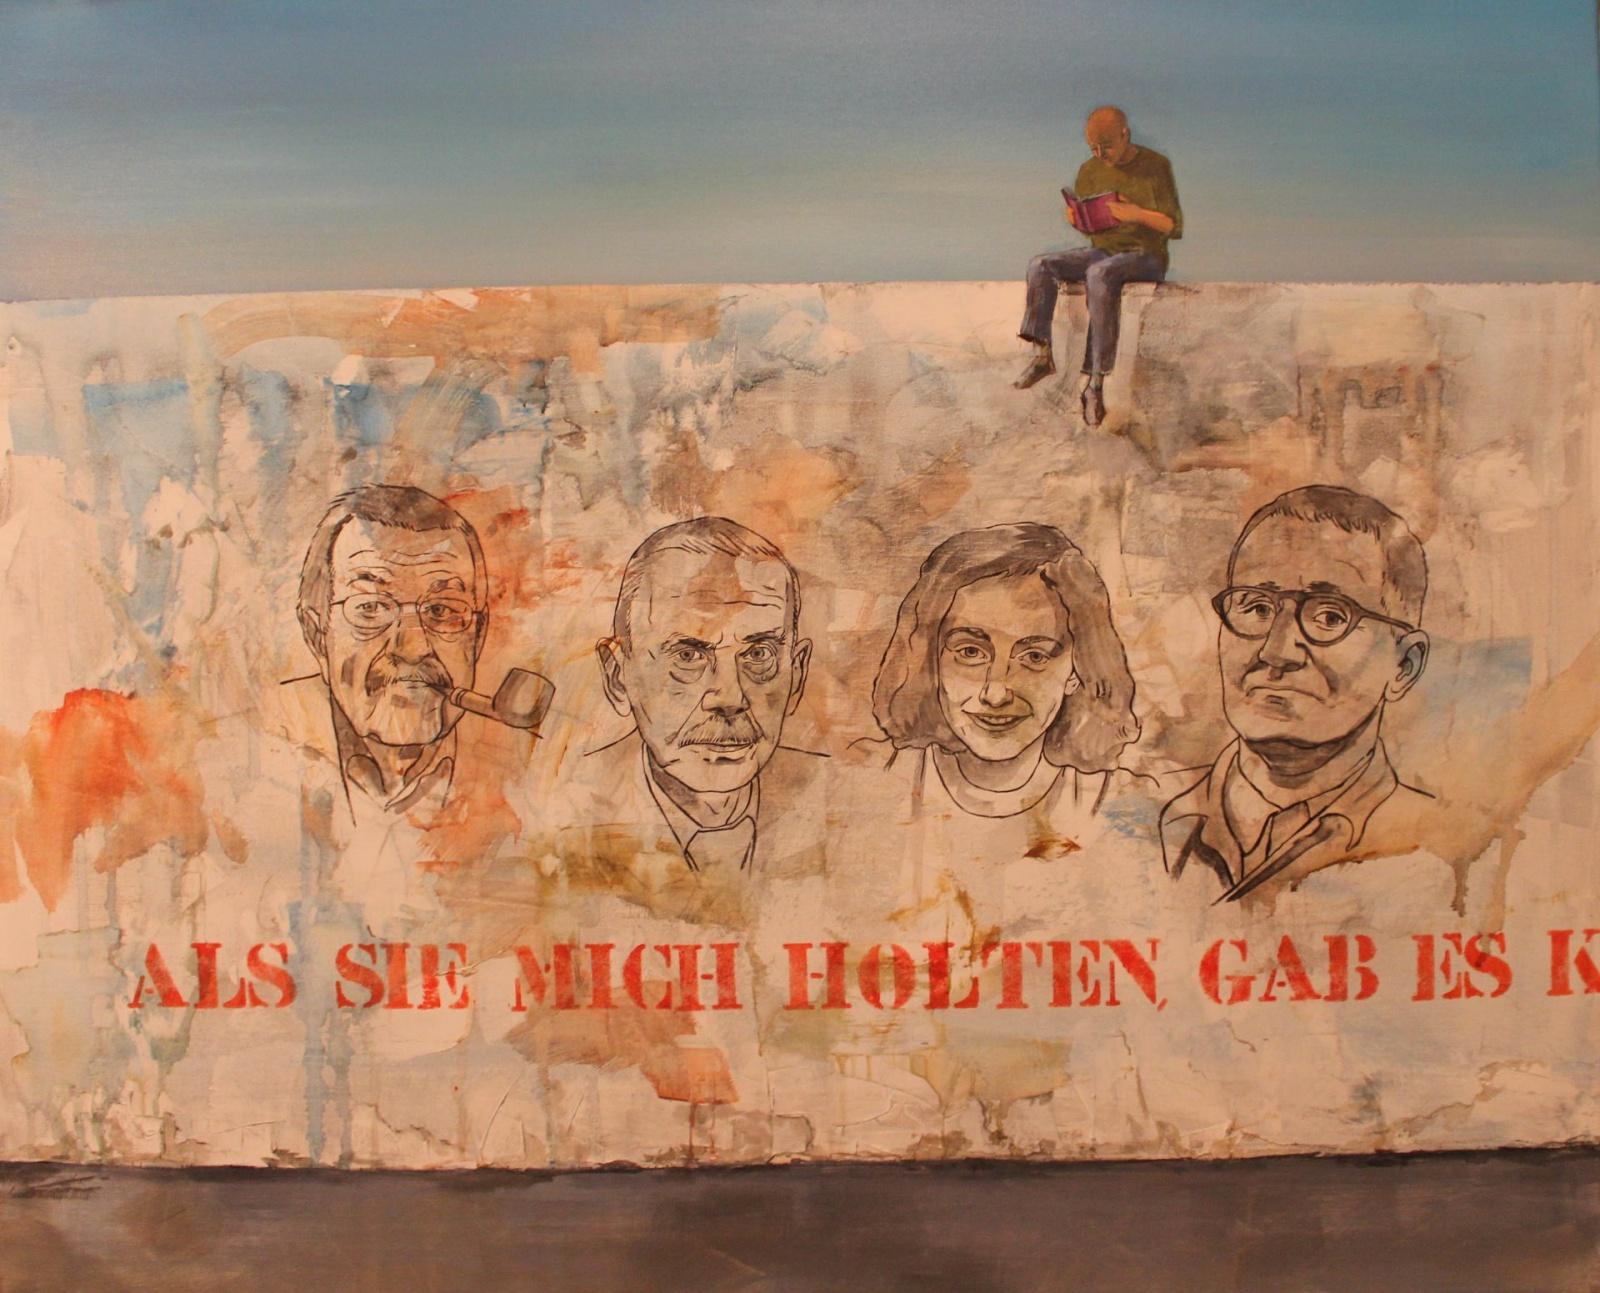 Günter Grass, Thomas Mann, Ana Frank, Bertolt Brecht,. El Arte Sanador de las heridas del ser humano.